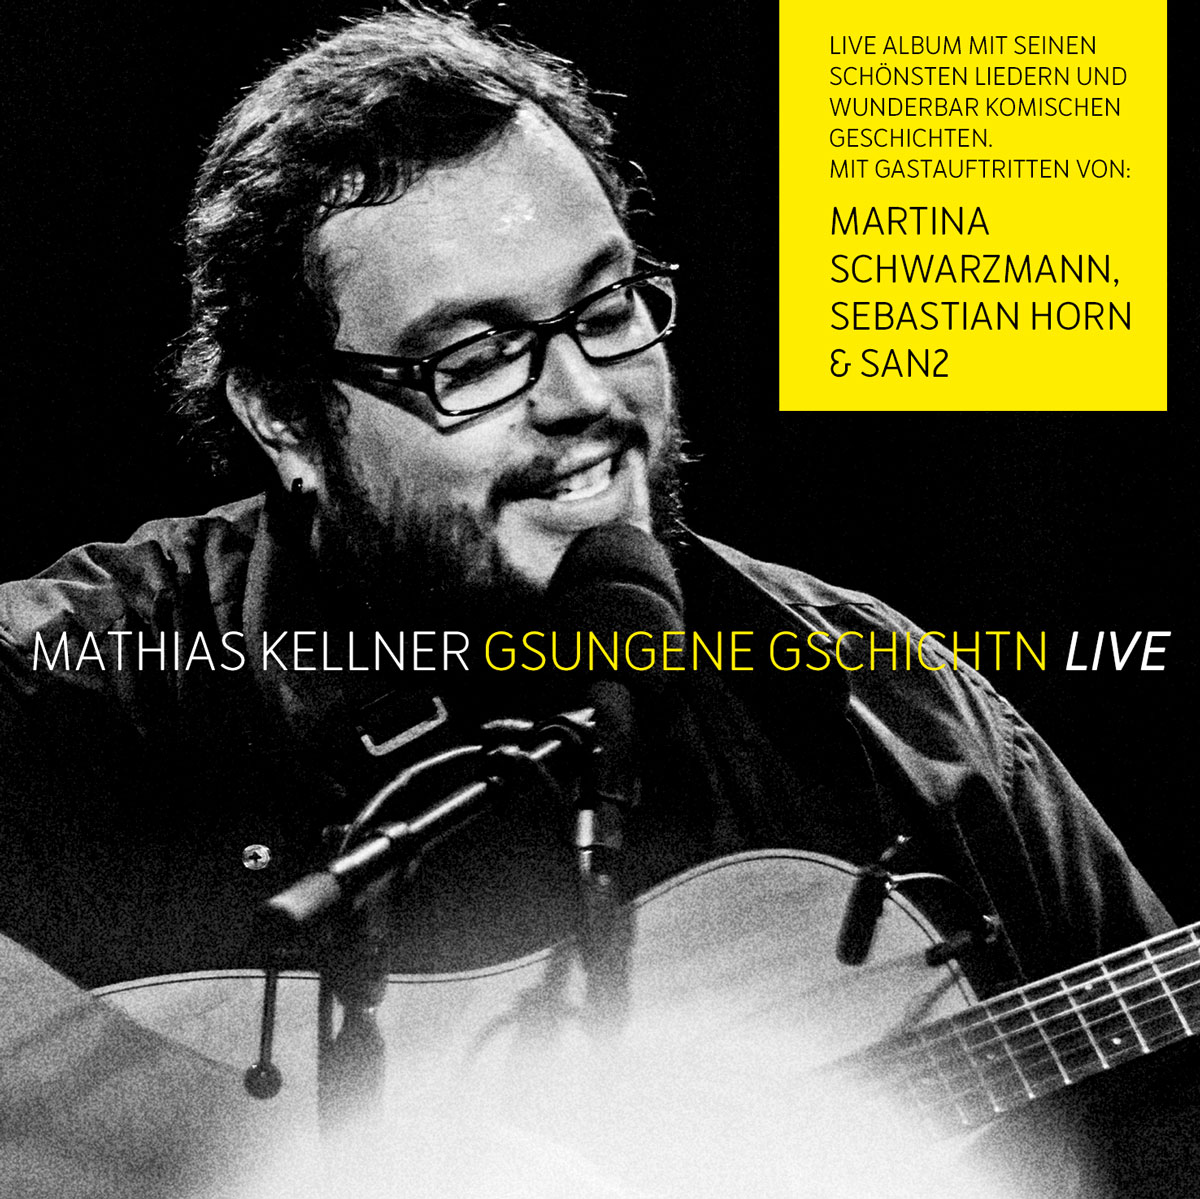 Mathias Kellner Solo - 1480418874s Webseite!